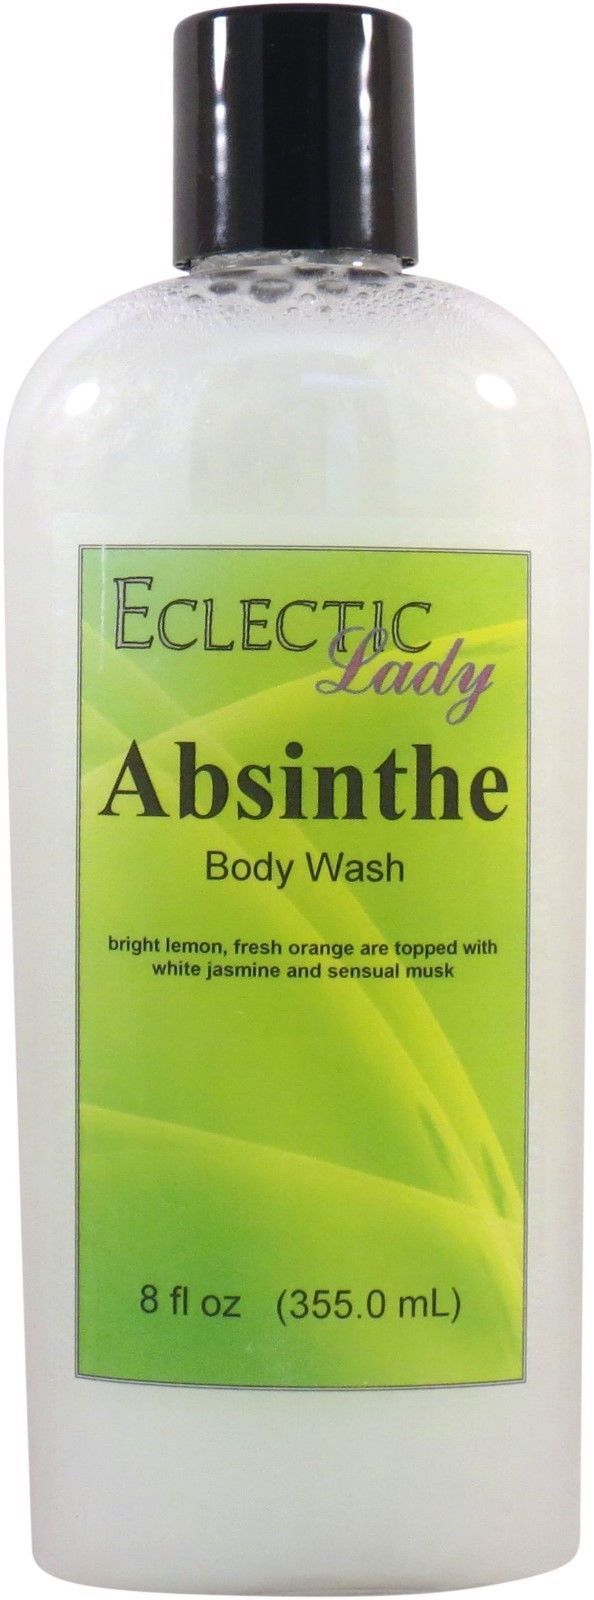 Absinthe Body Wash